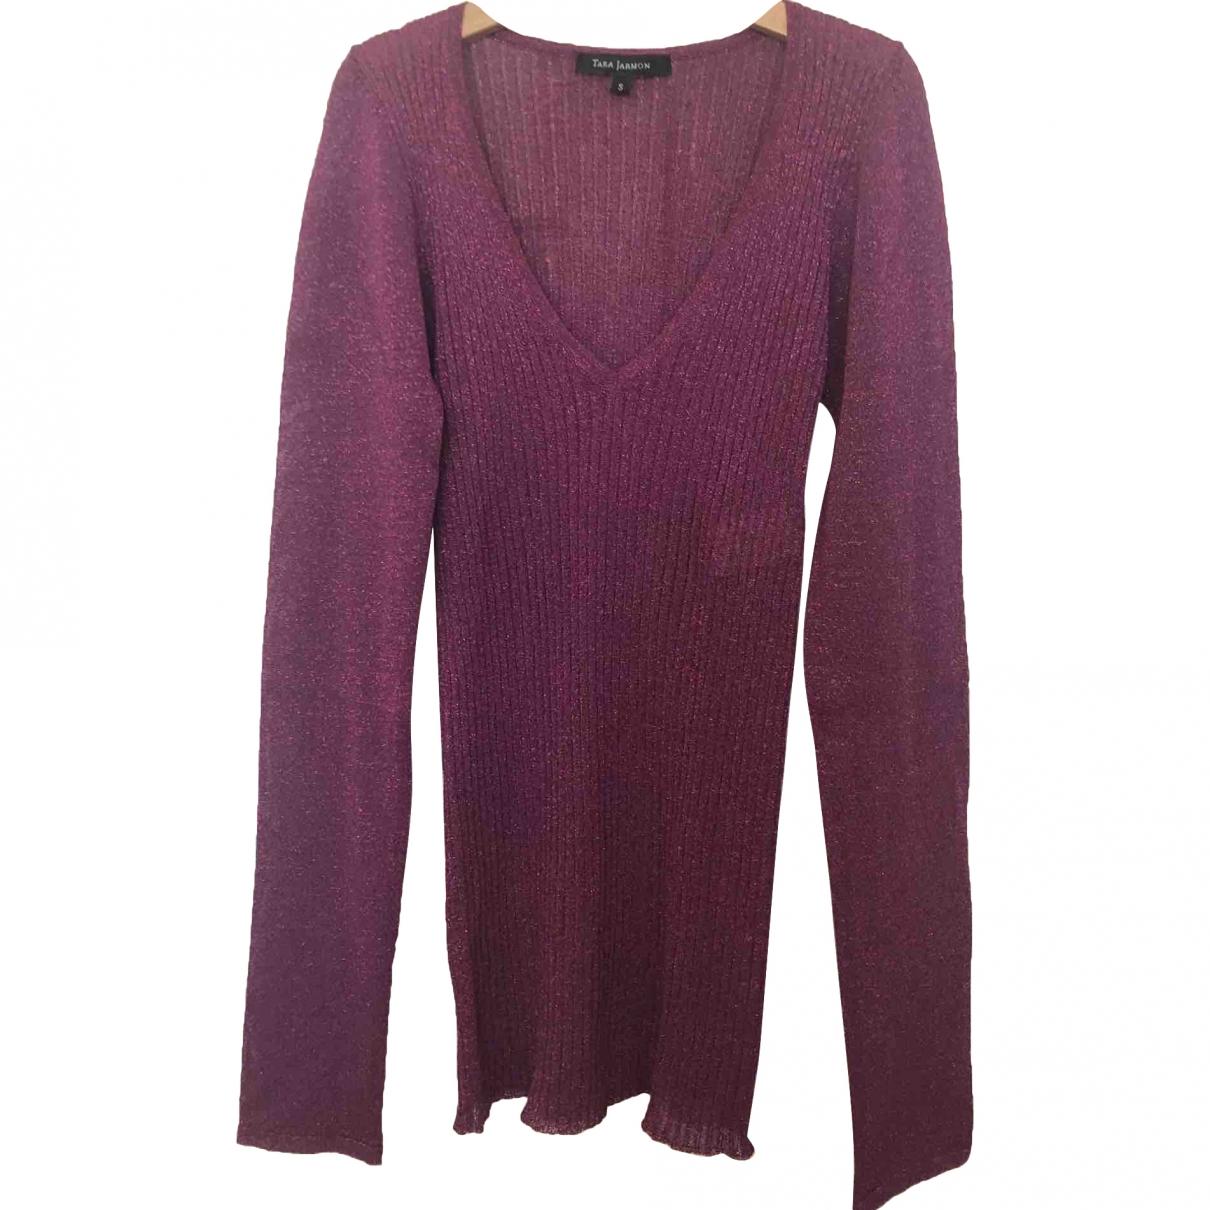 Tara Jarmon \N Pink Knitwear for Women S International